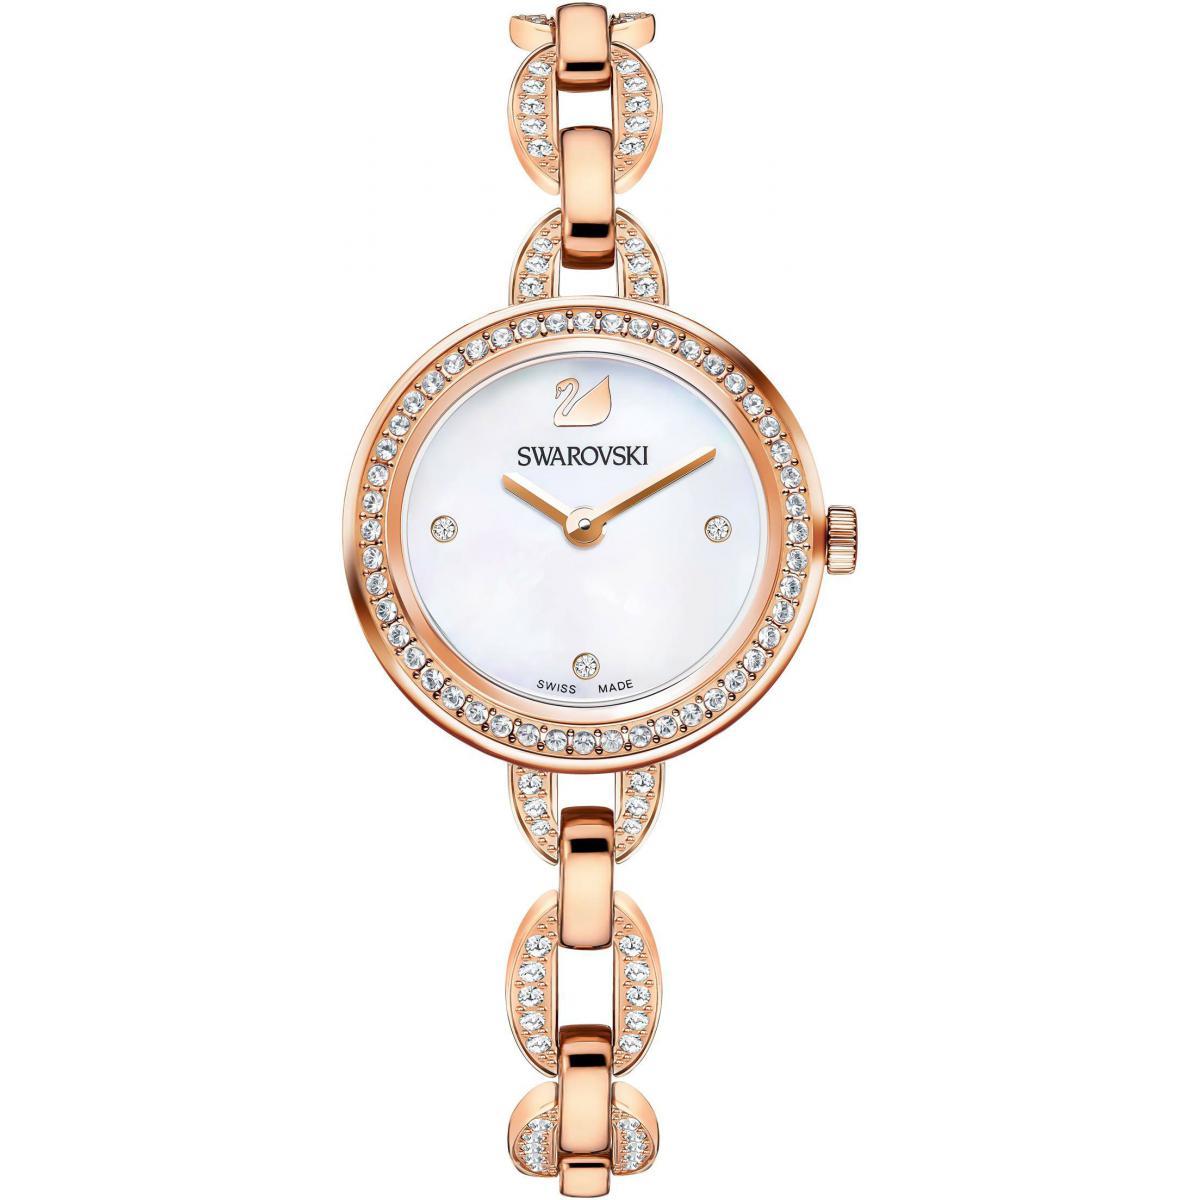 bracelet femme swarovski pas cher